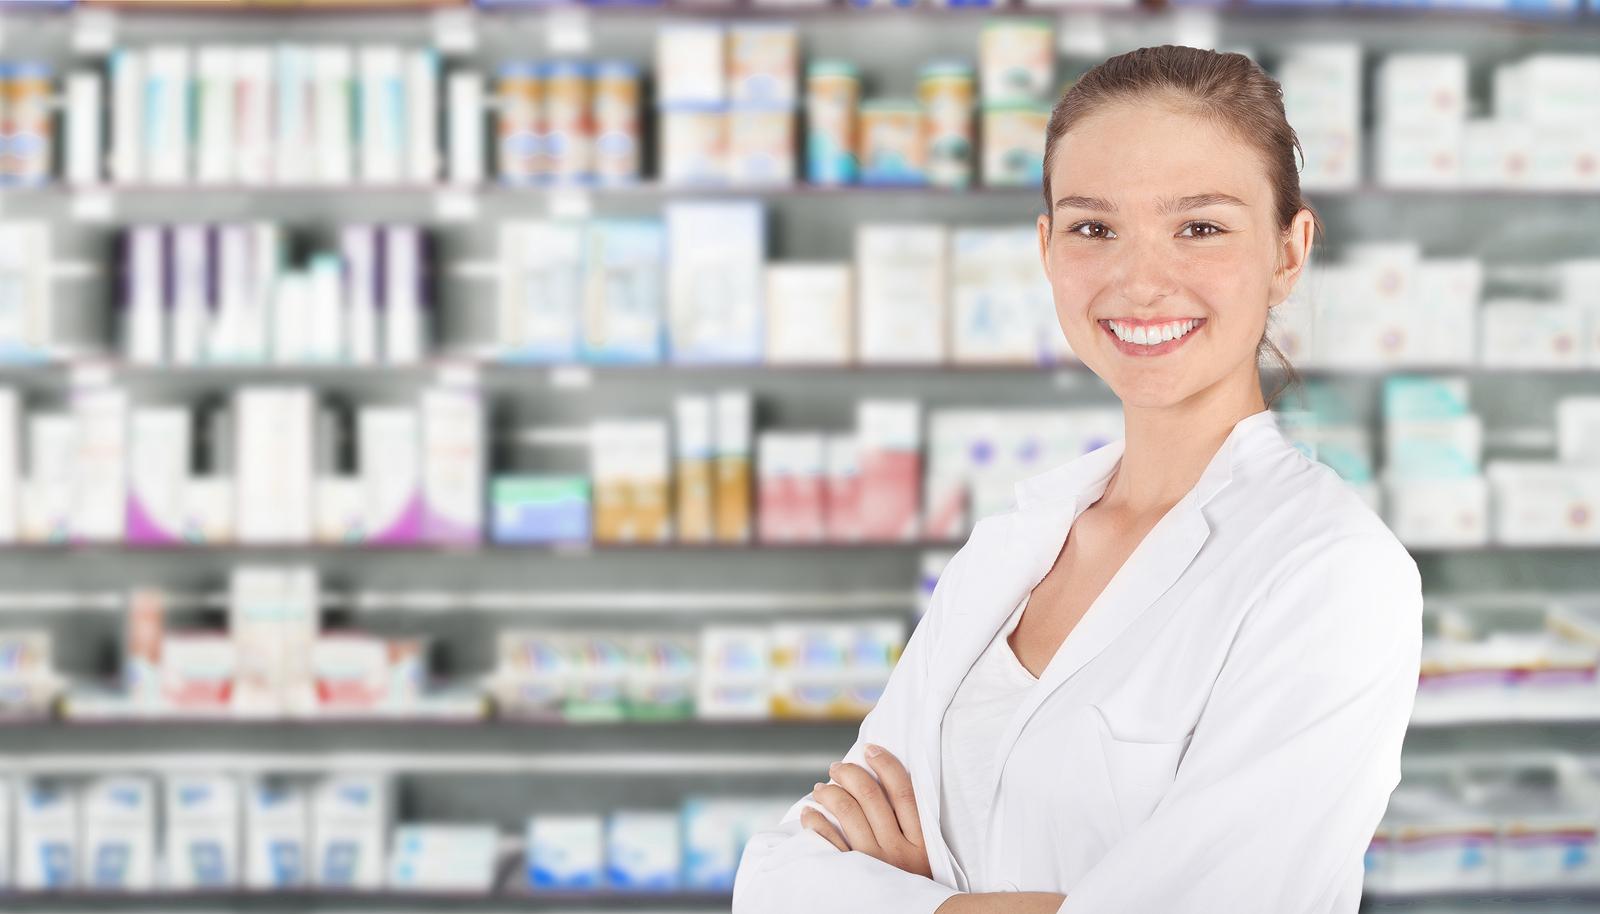 Free Test Prep For The Ptcb Pharmacy Technician Certification Exam